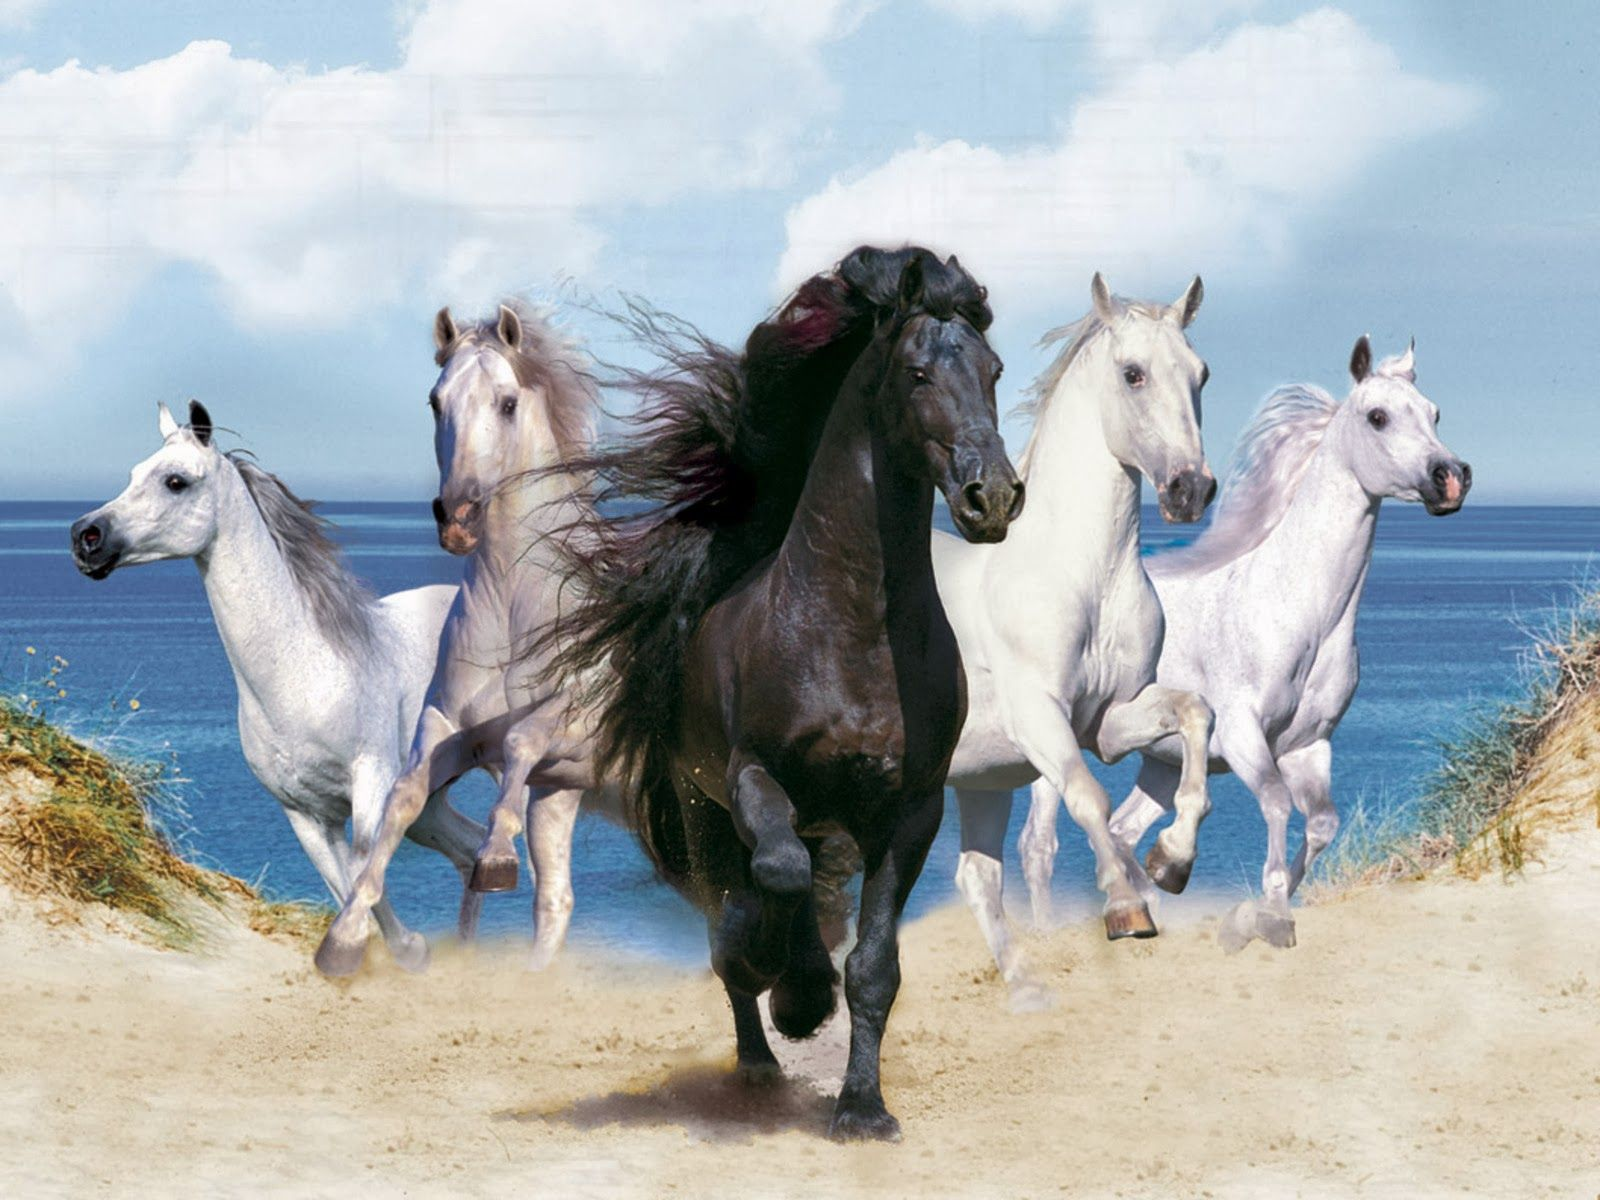 Good Wallpaper Horse Valentines Day - 5e23b597b7f1360b663ab5e1d771f824  Graphic_93628.jpg